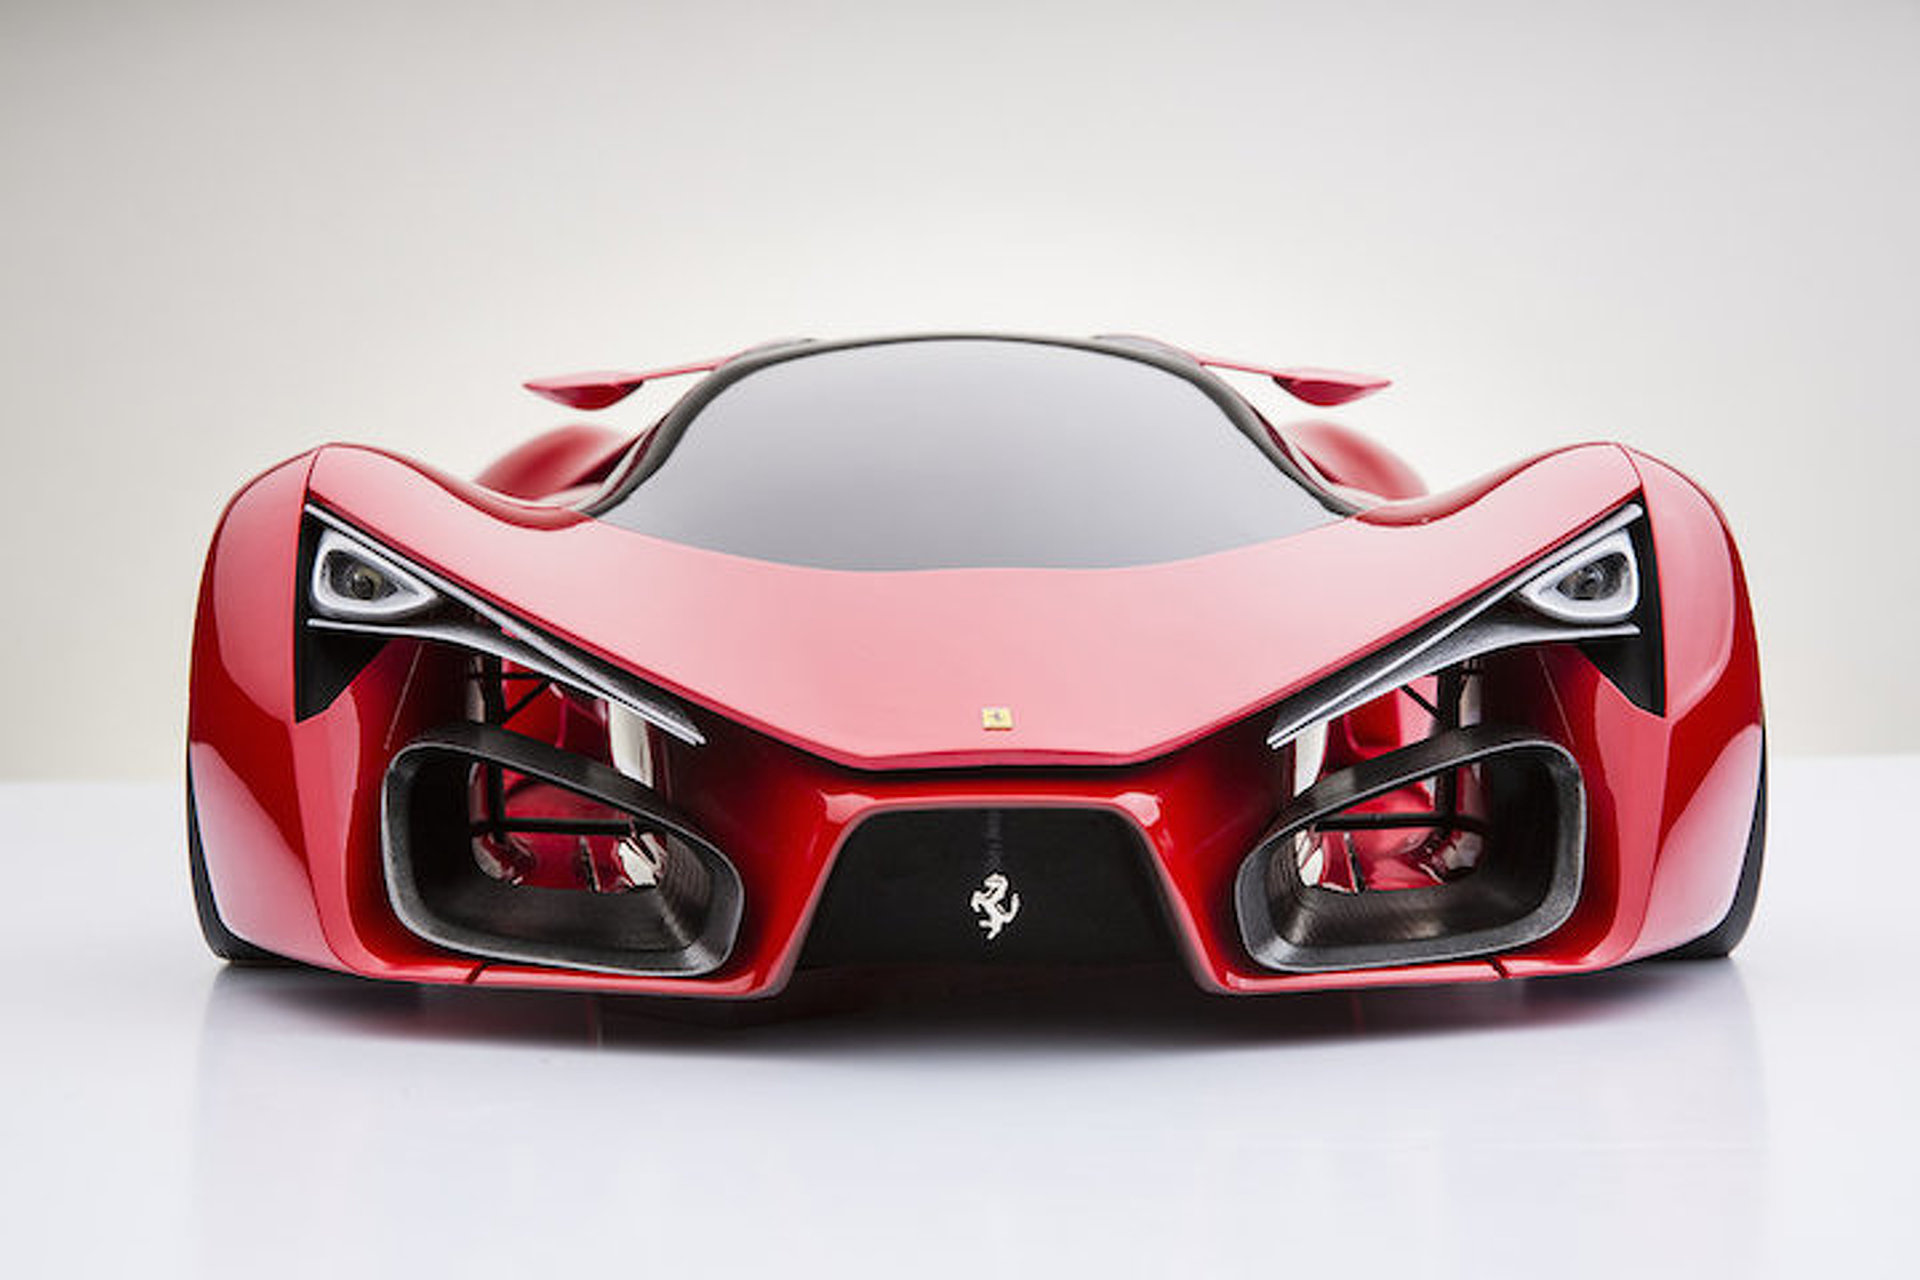 1200hp Ferrari F80 Supercar Could Hit 310mphif It Were Real Electric Car Circuit Diagram